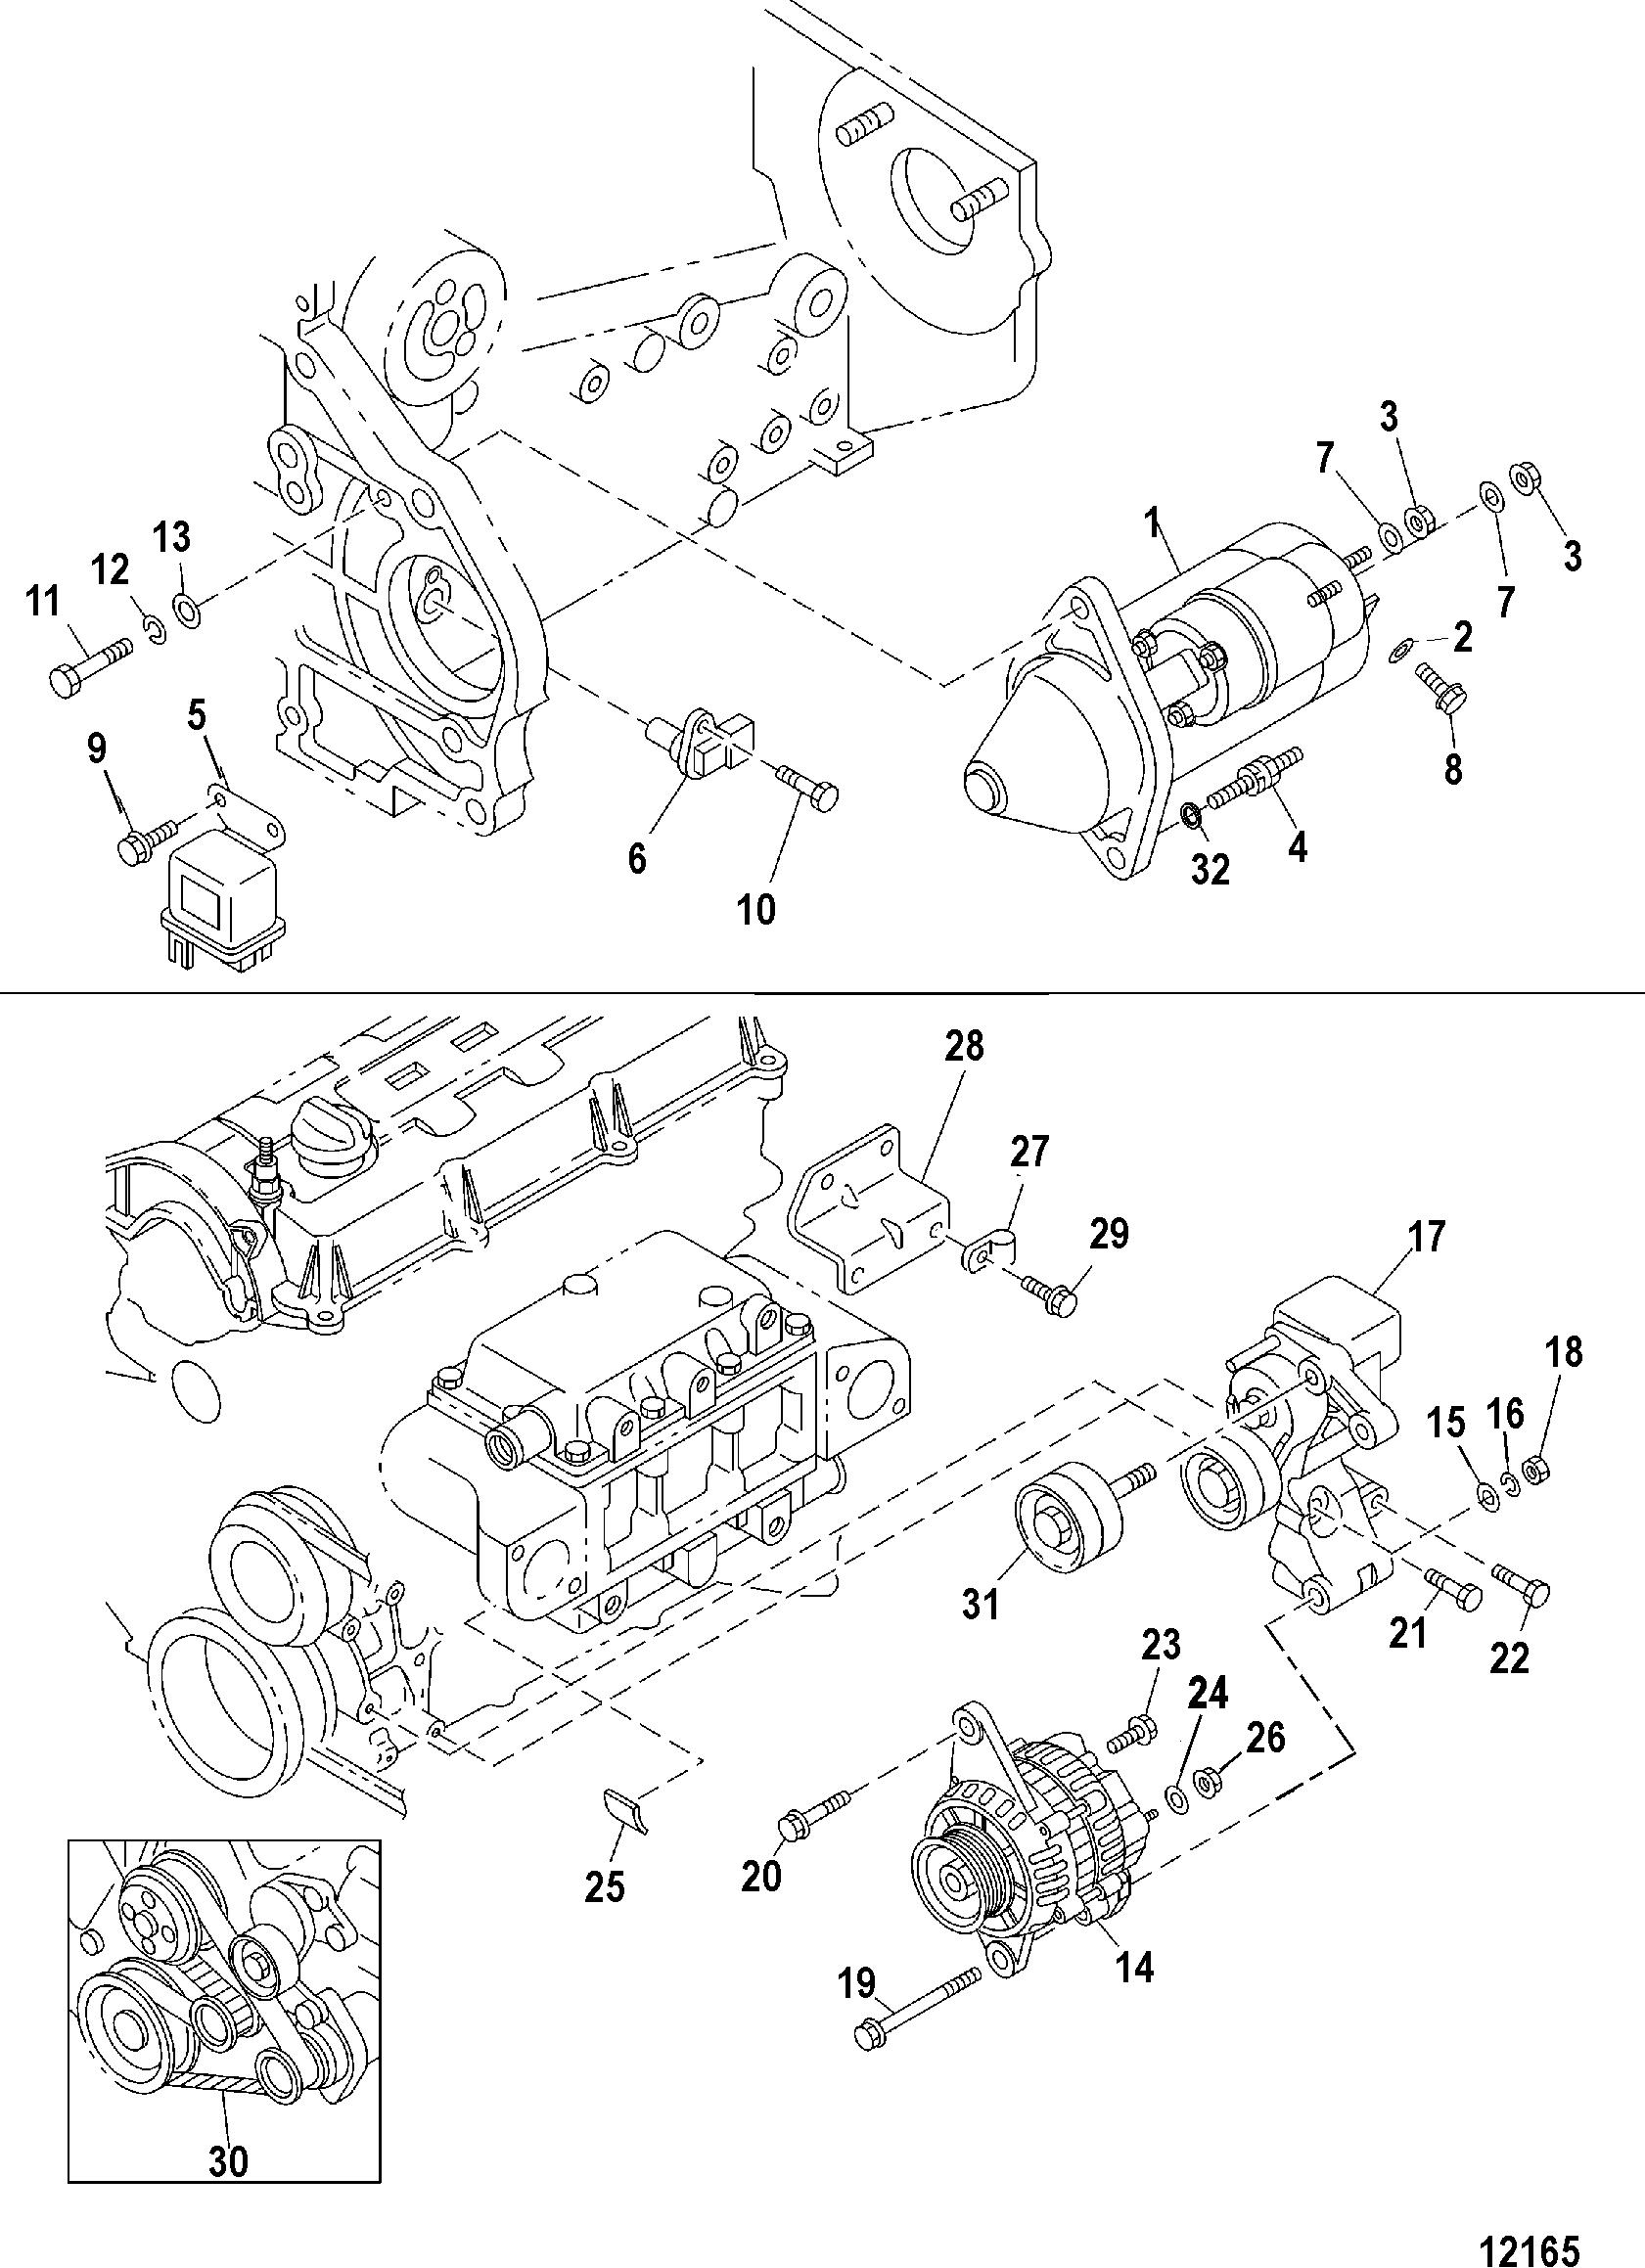 mercruiser cmd 1 7 mi 120 i l4 88109041 5.7 Mercruiser Engine Wiring Diagram starter and alternator